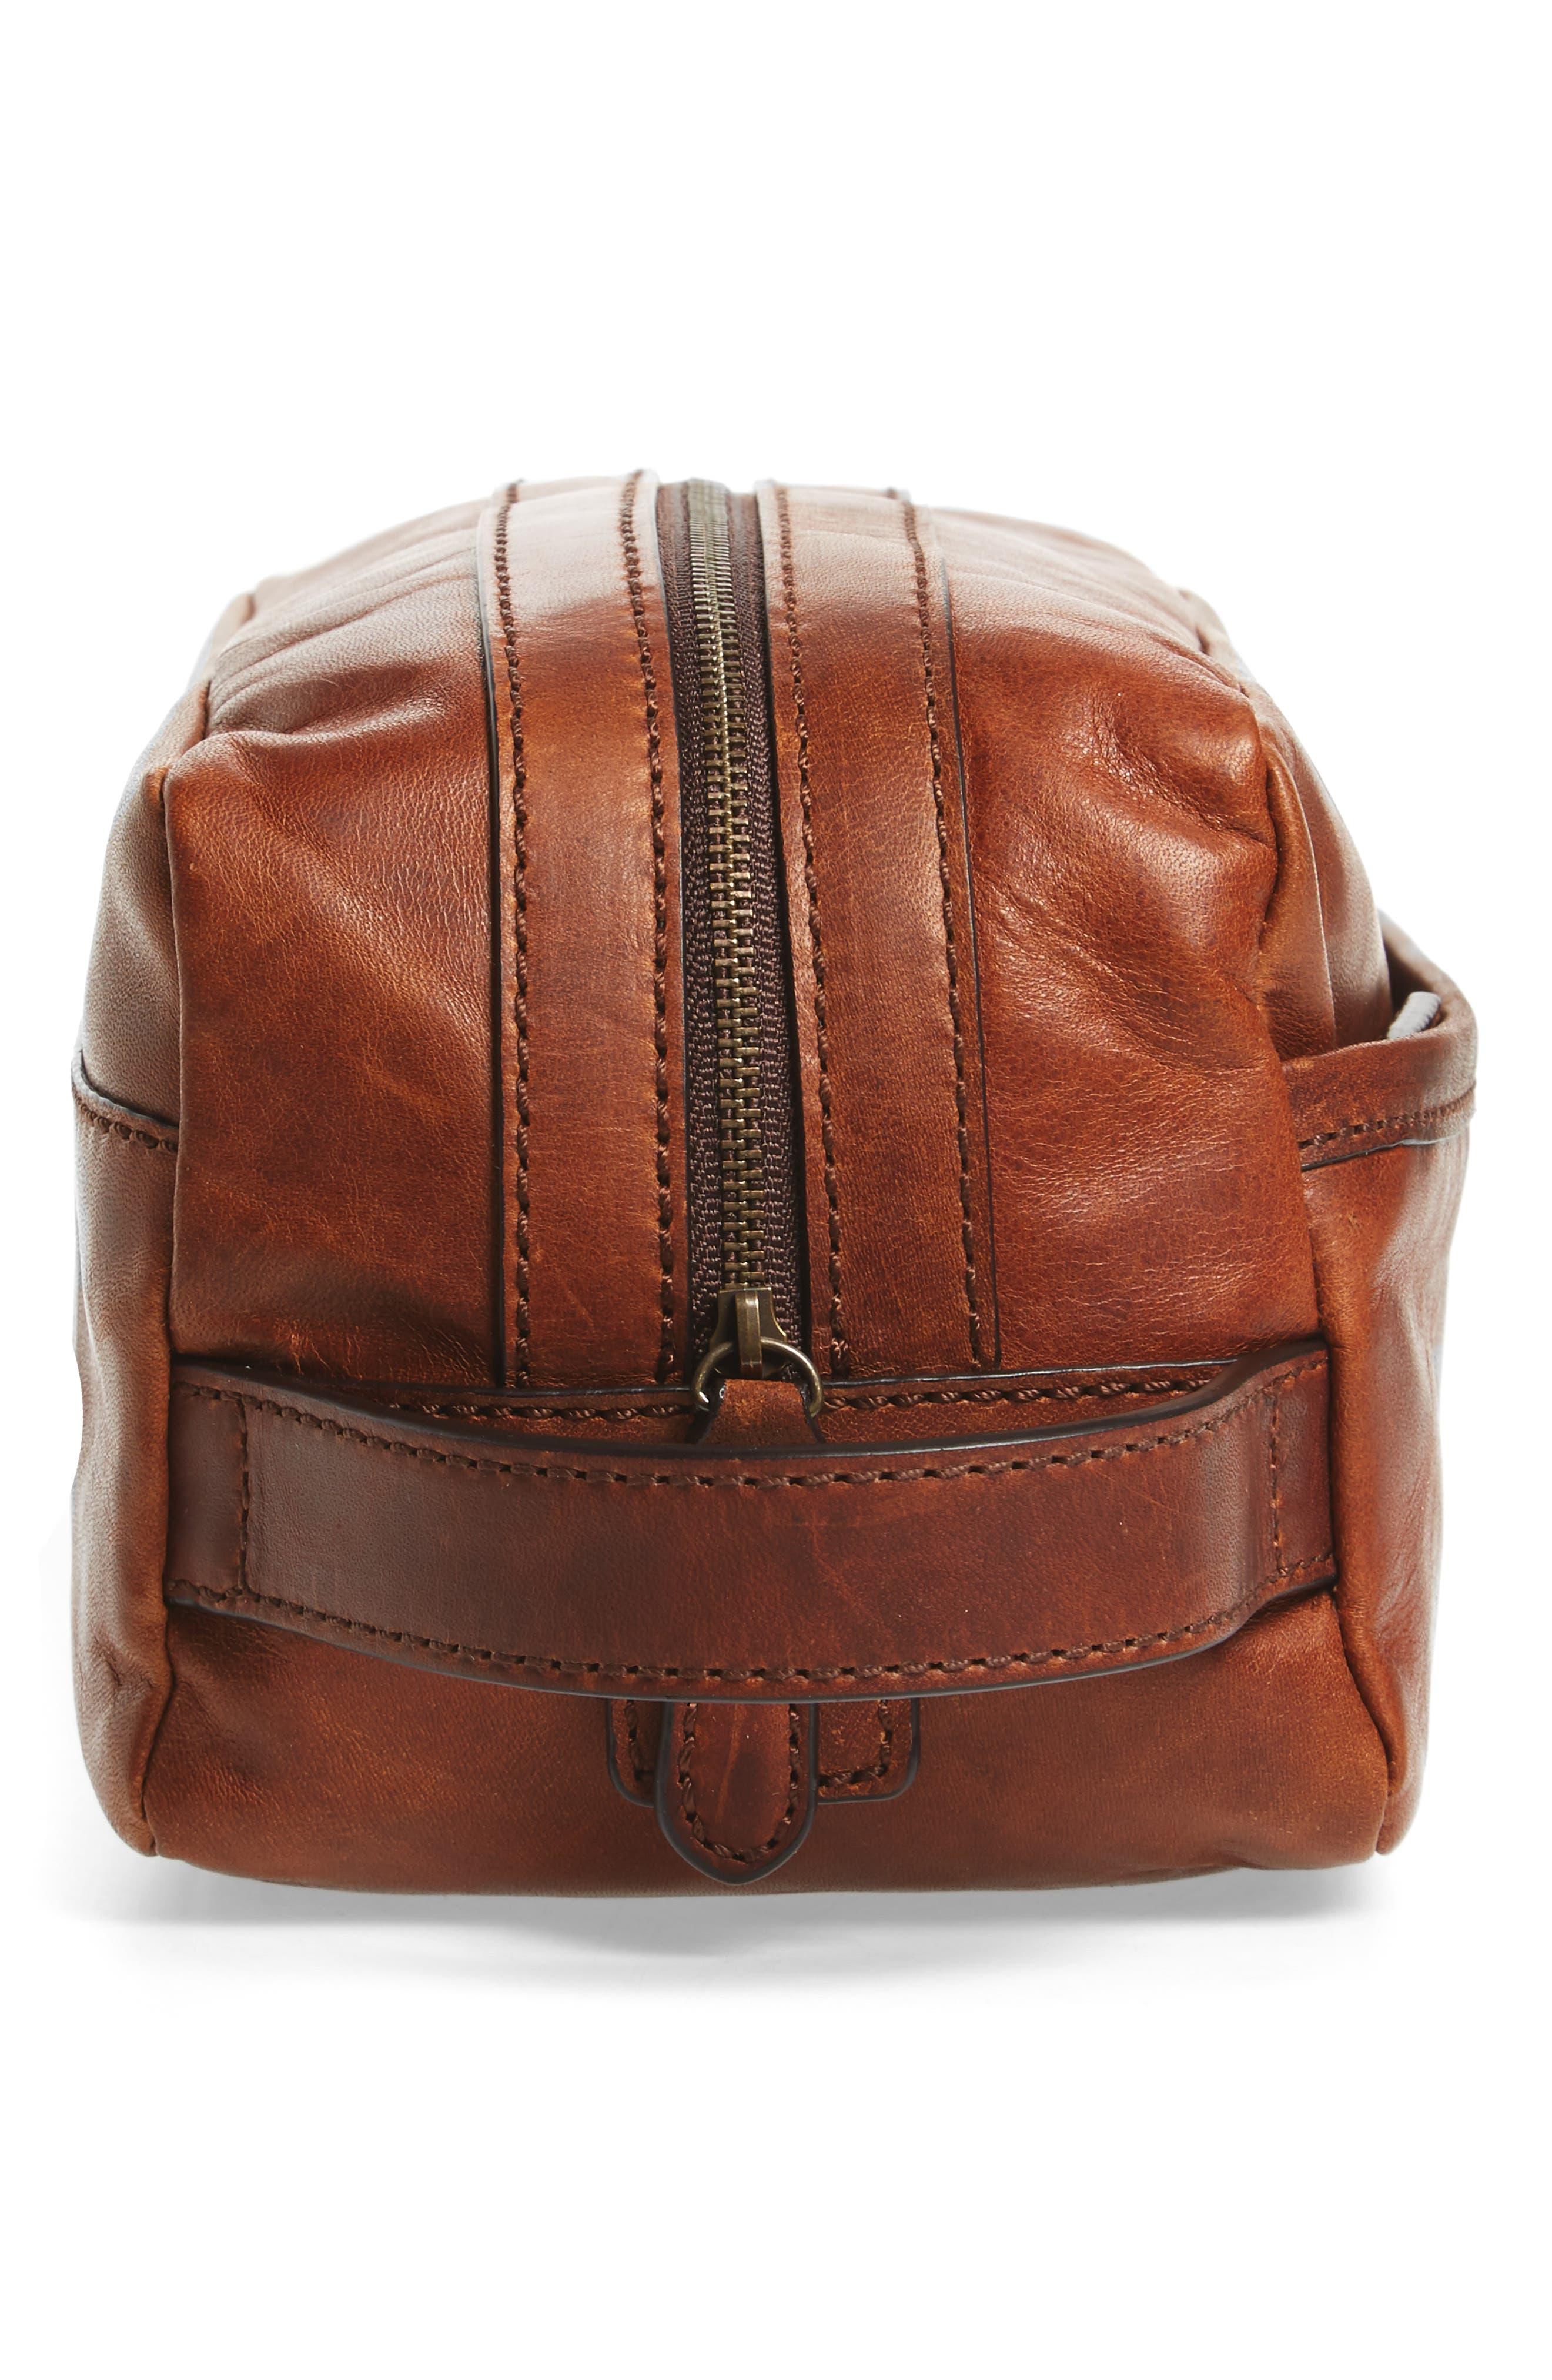 'Logan' Leather Travel Kit,                             Alternate thumbnail 3, color,                             Cognac